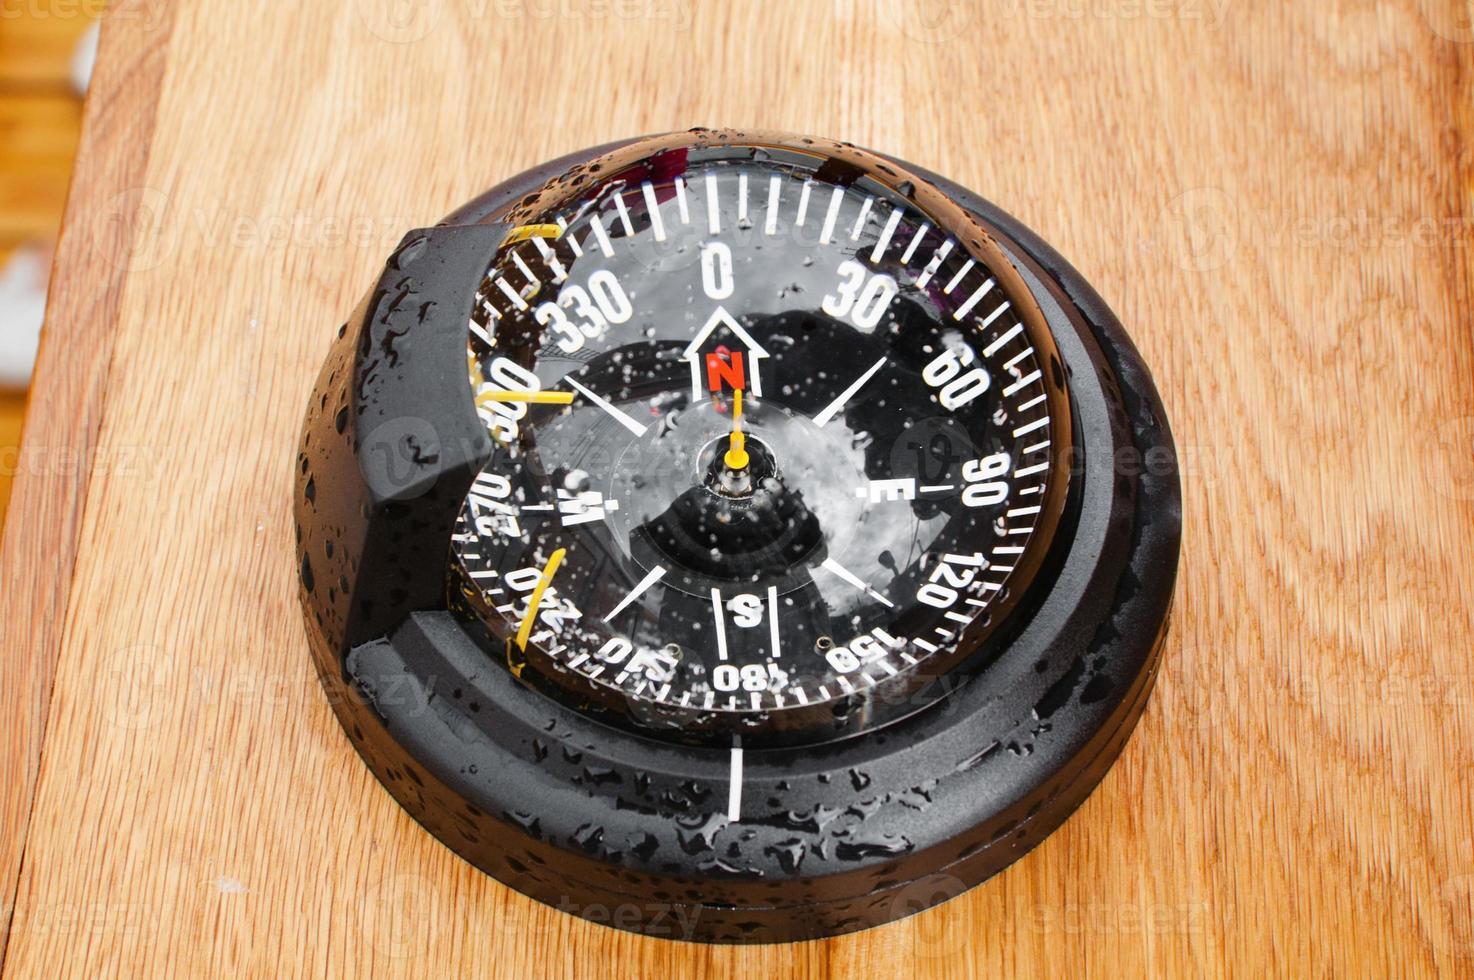 yacht compass, close-up photo